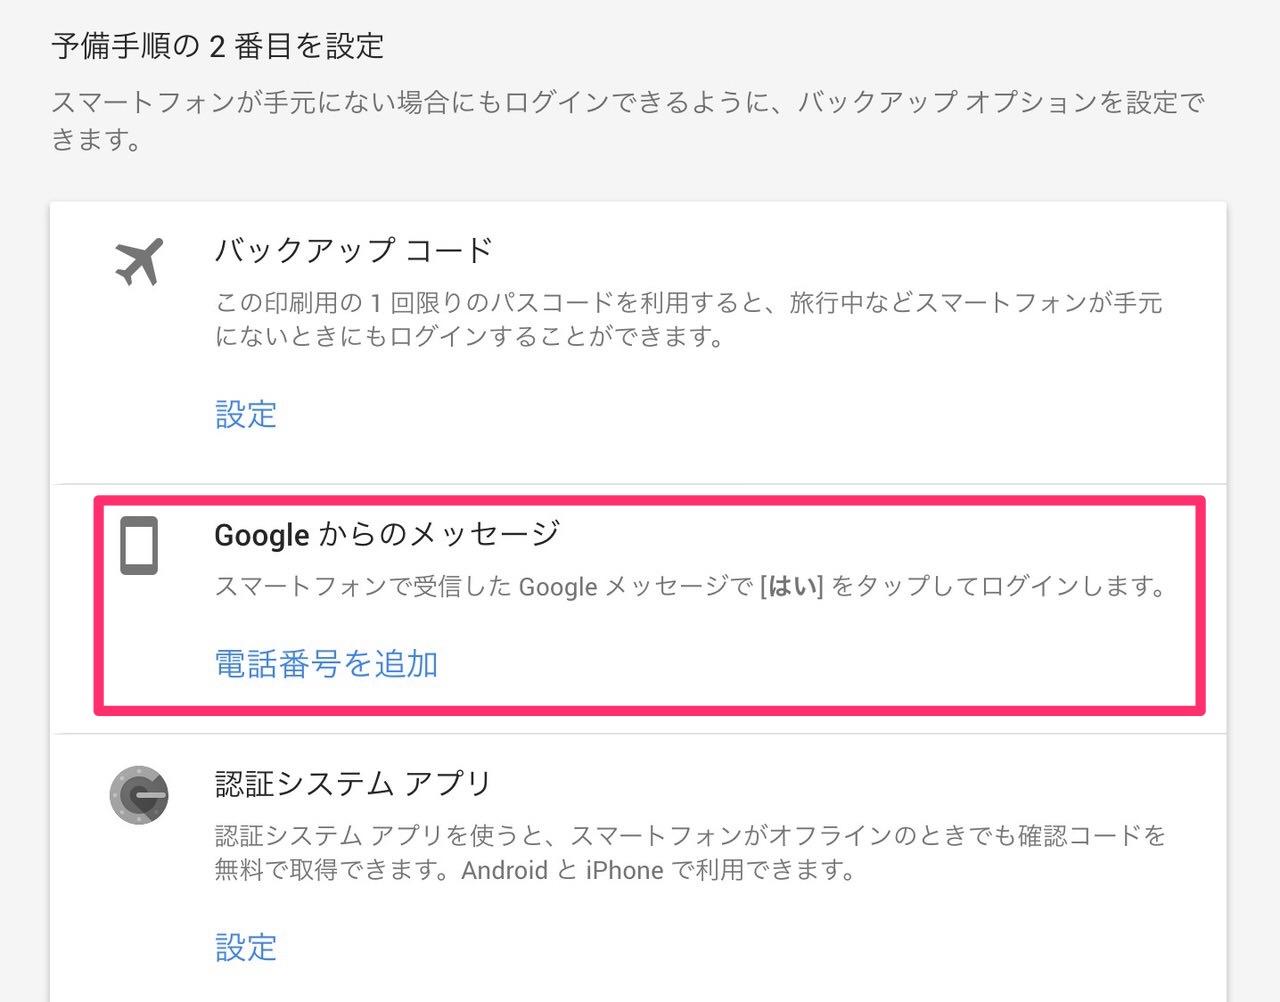 Google 06 23 1051